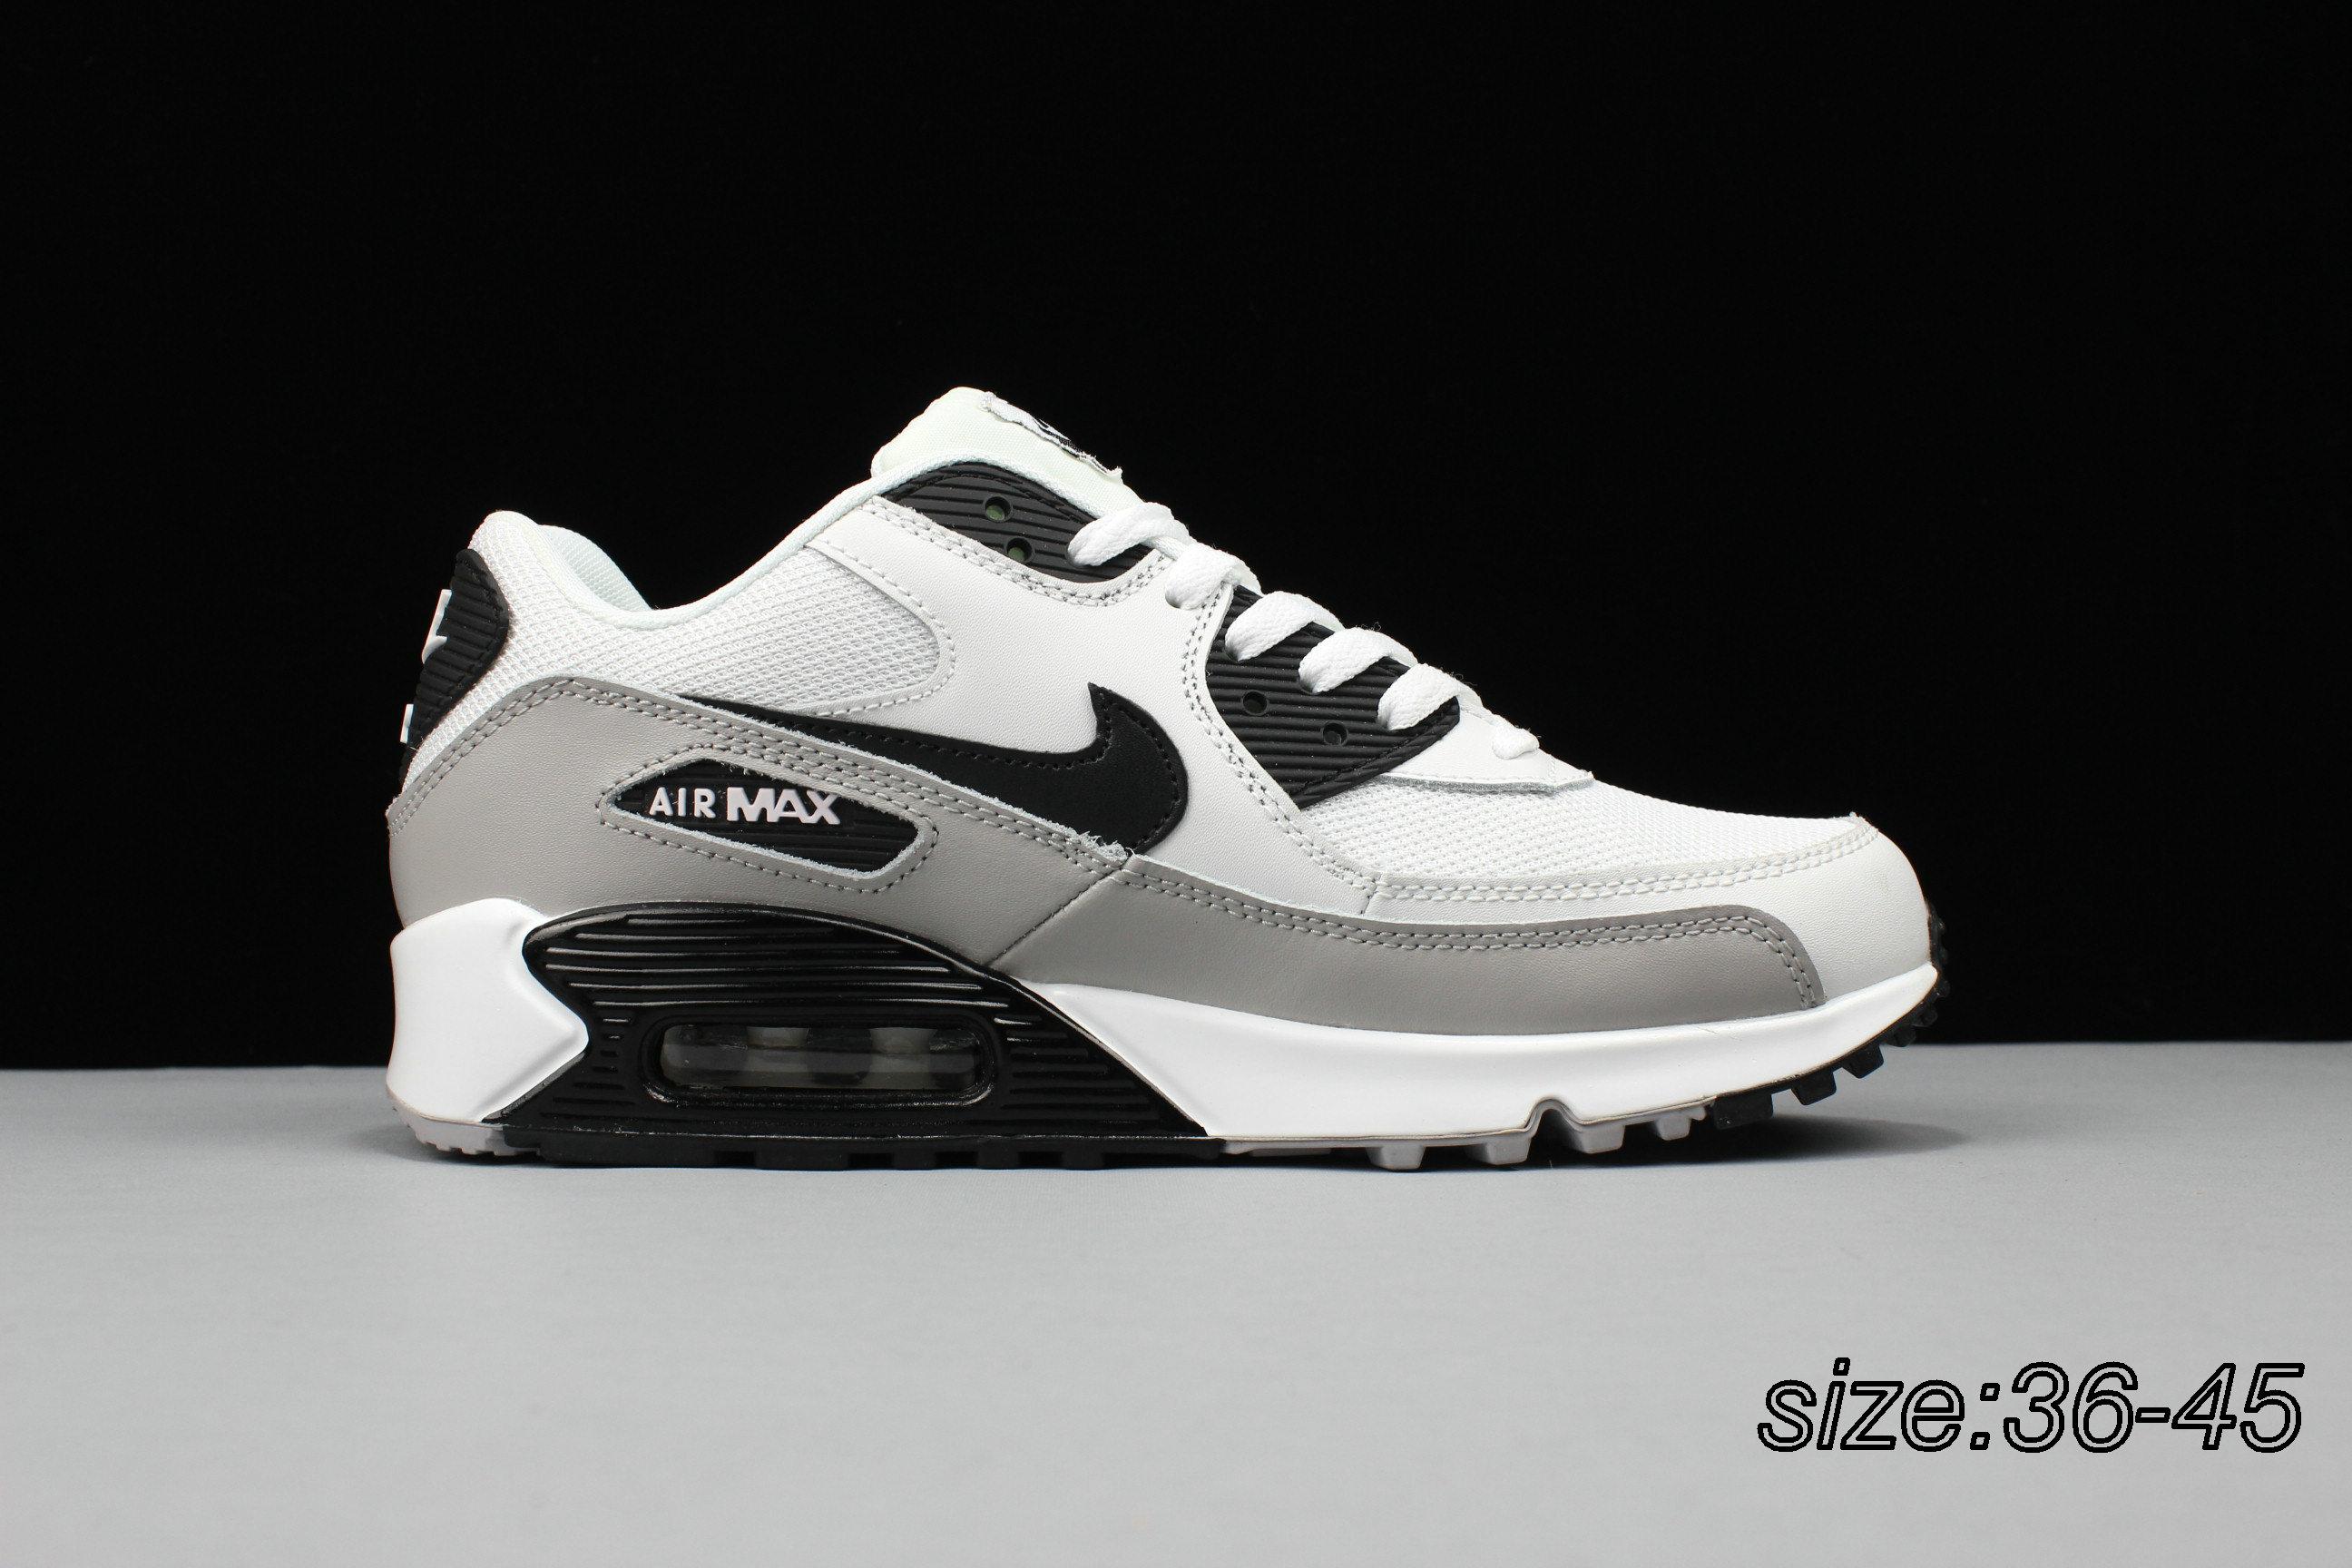 sports shoes e784d 76db9 ... reptile crocodile shoes nike silver womens black cheapest b2896 e1006   promo code for nike air max 90 white grey c9750 d57d9